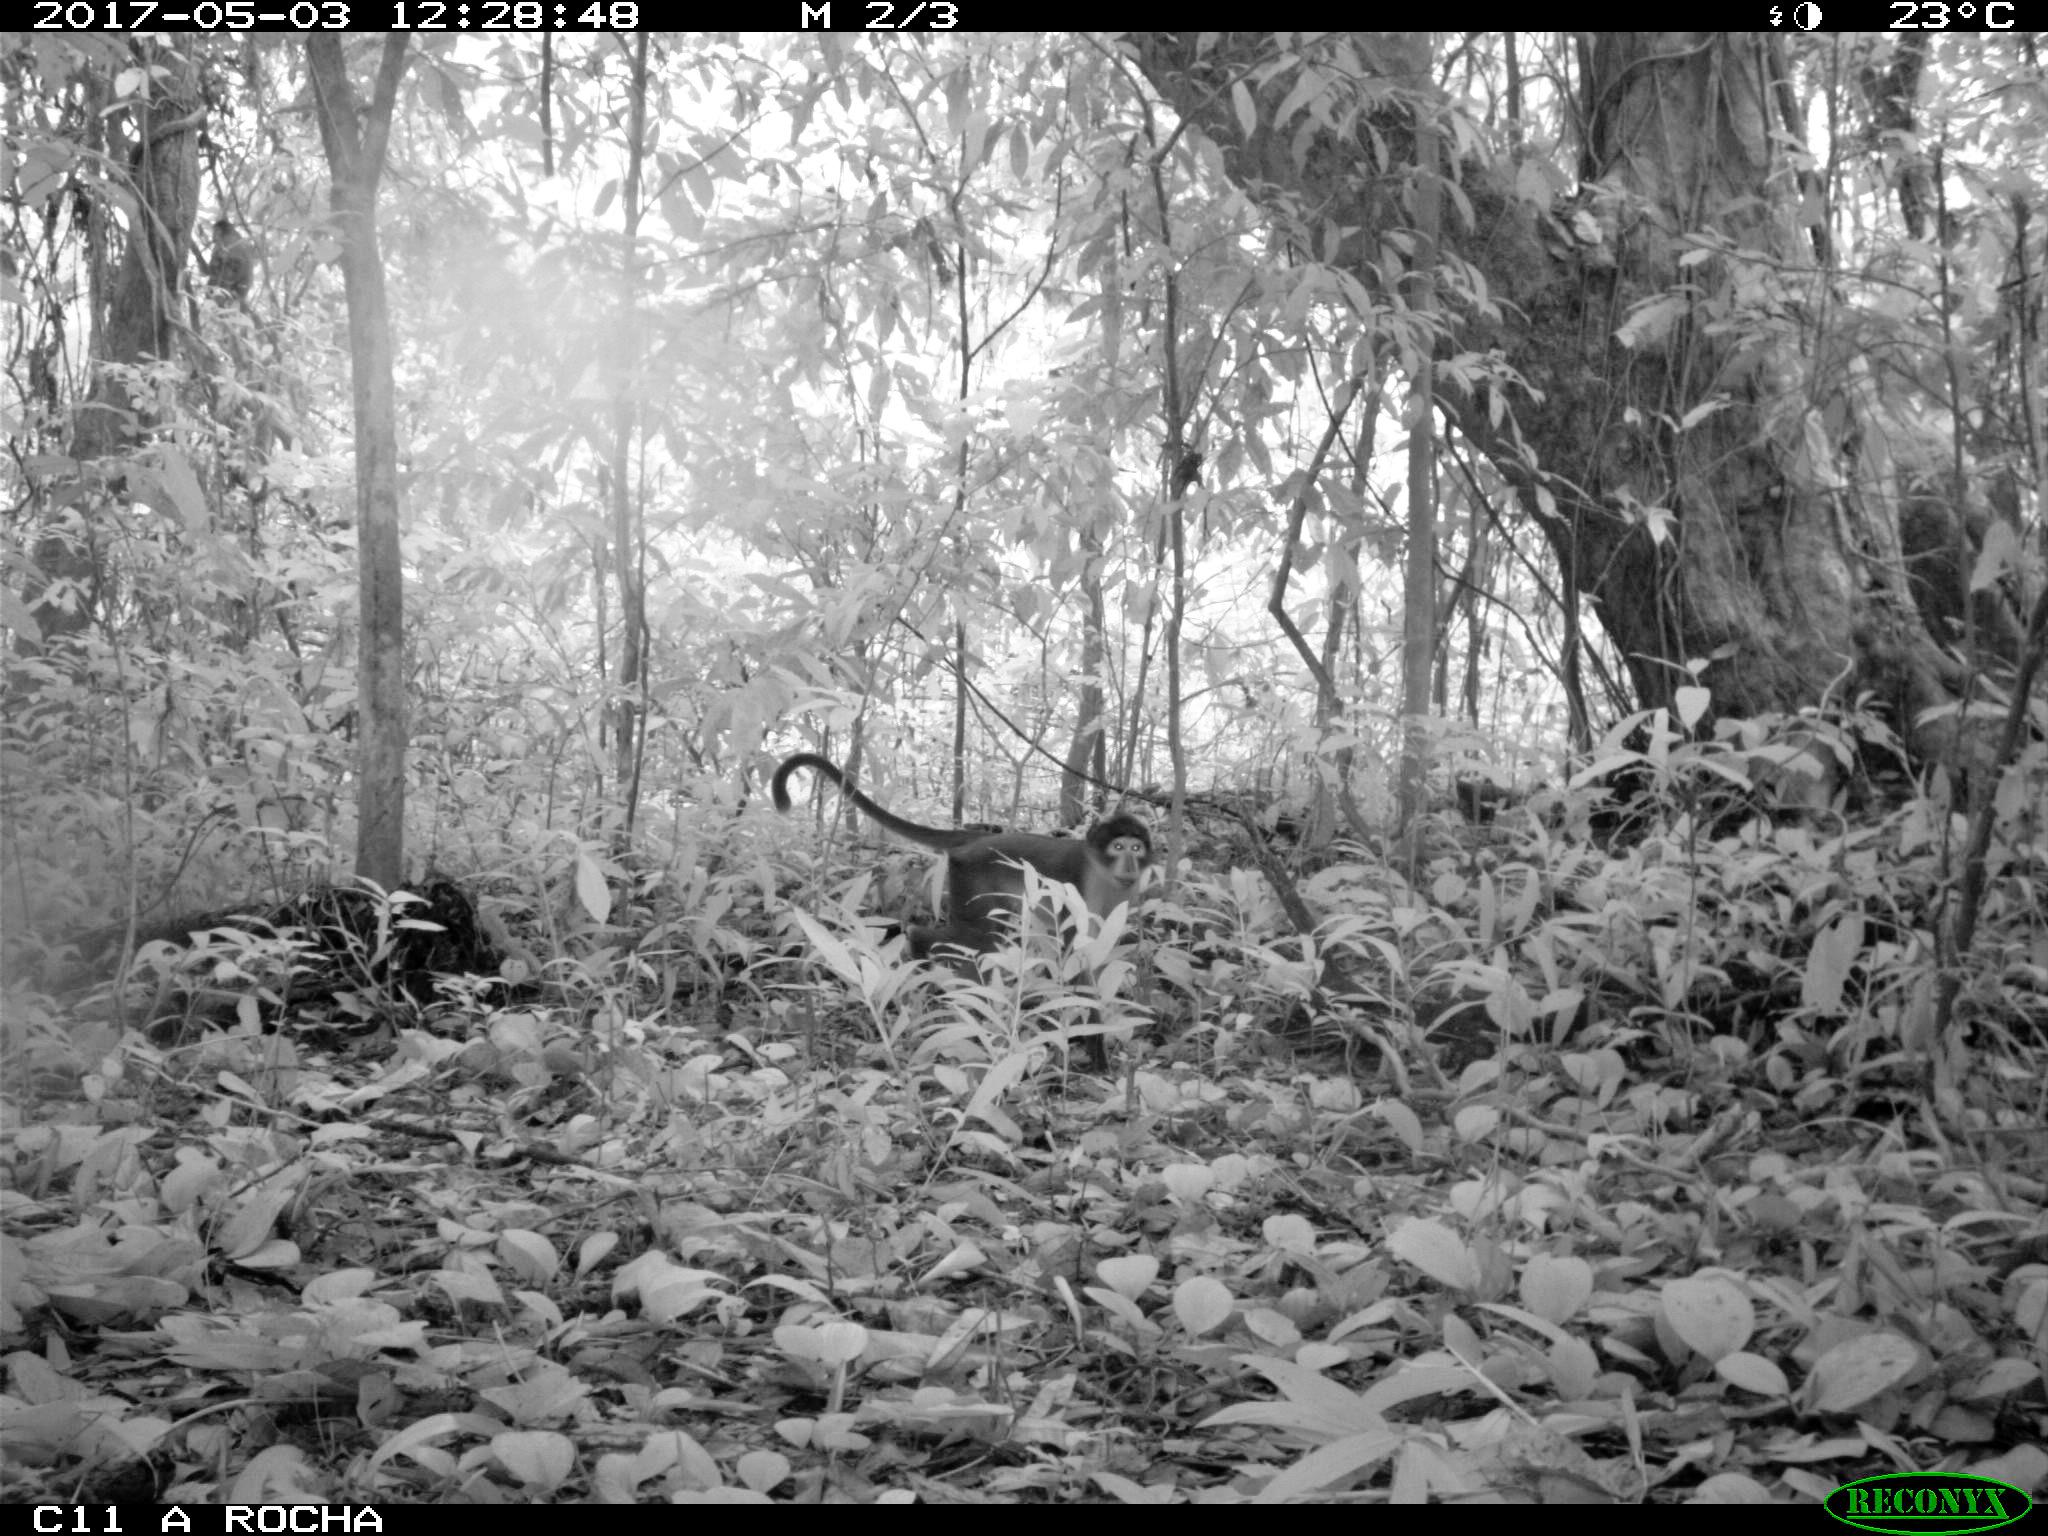 White-naped Mangabey (Cercocebus lunulatus) caught on camera trap 2017-05-03 Atewa Forest Ghana - (c) A Rocha International